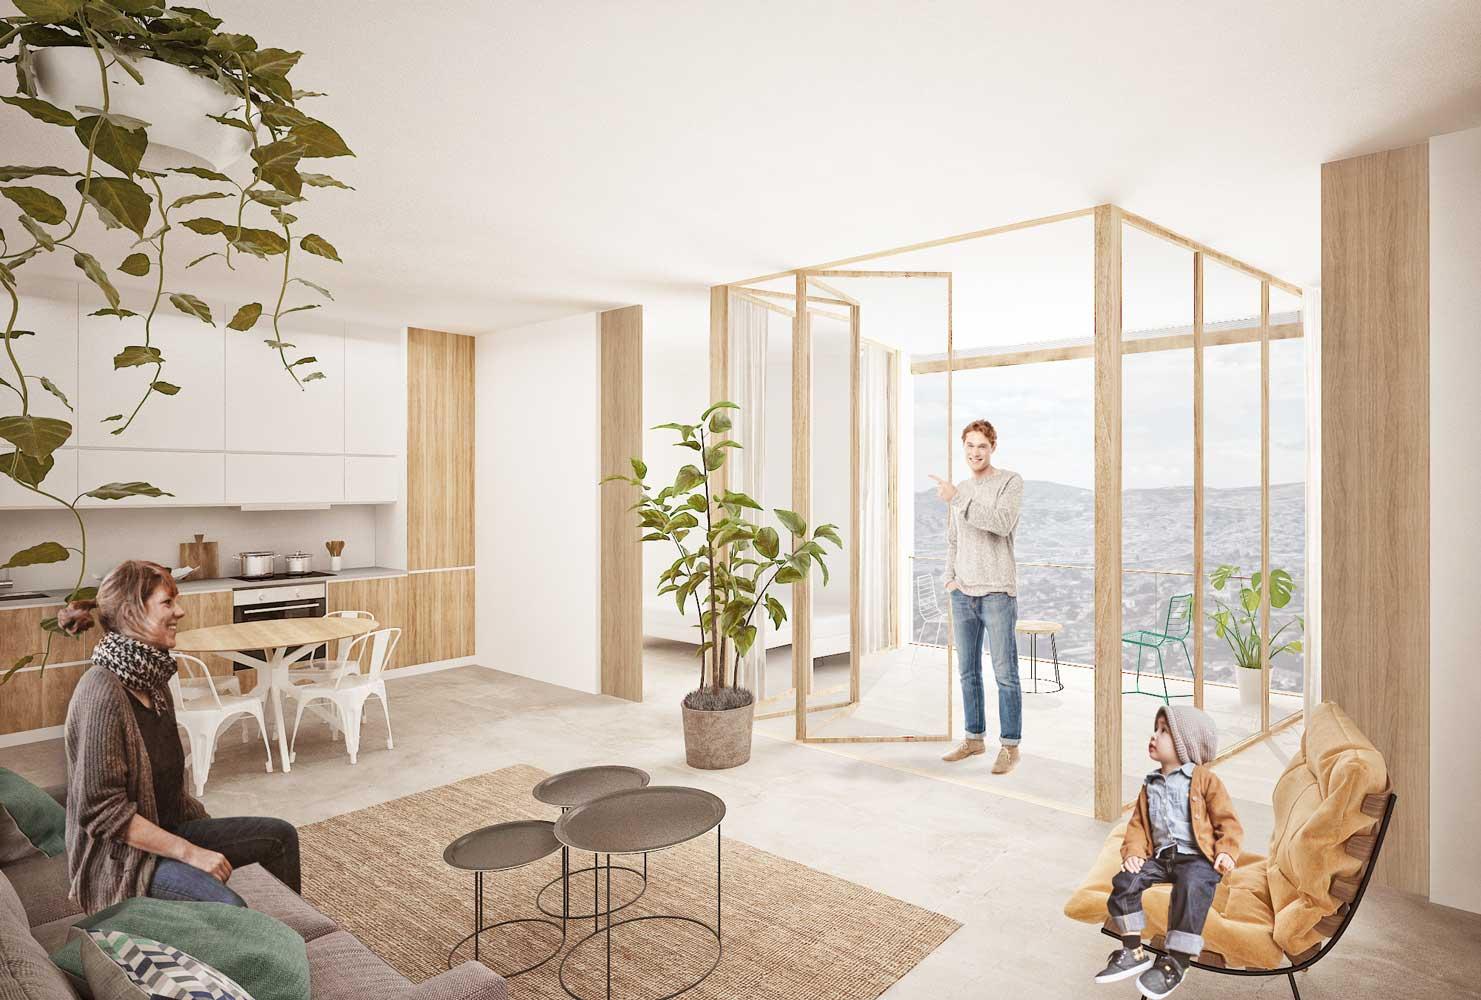 concurso vivienda protegida masnou sostenible arquitopia, vista interior